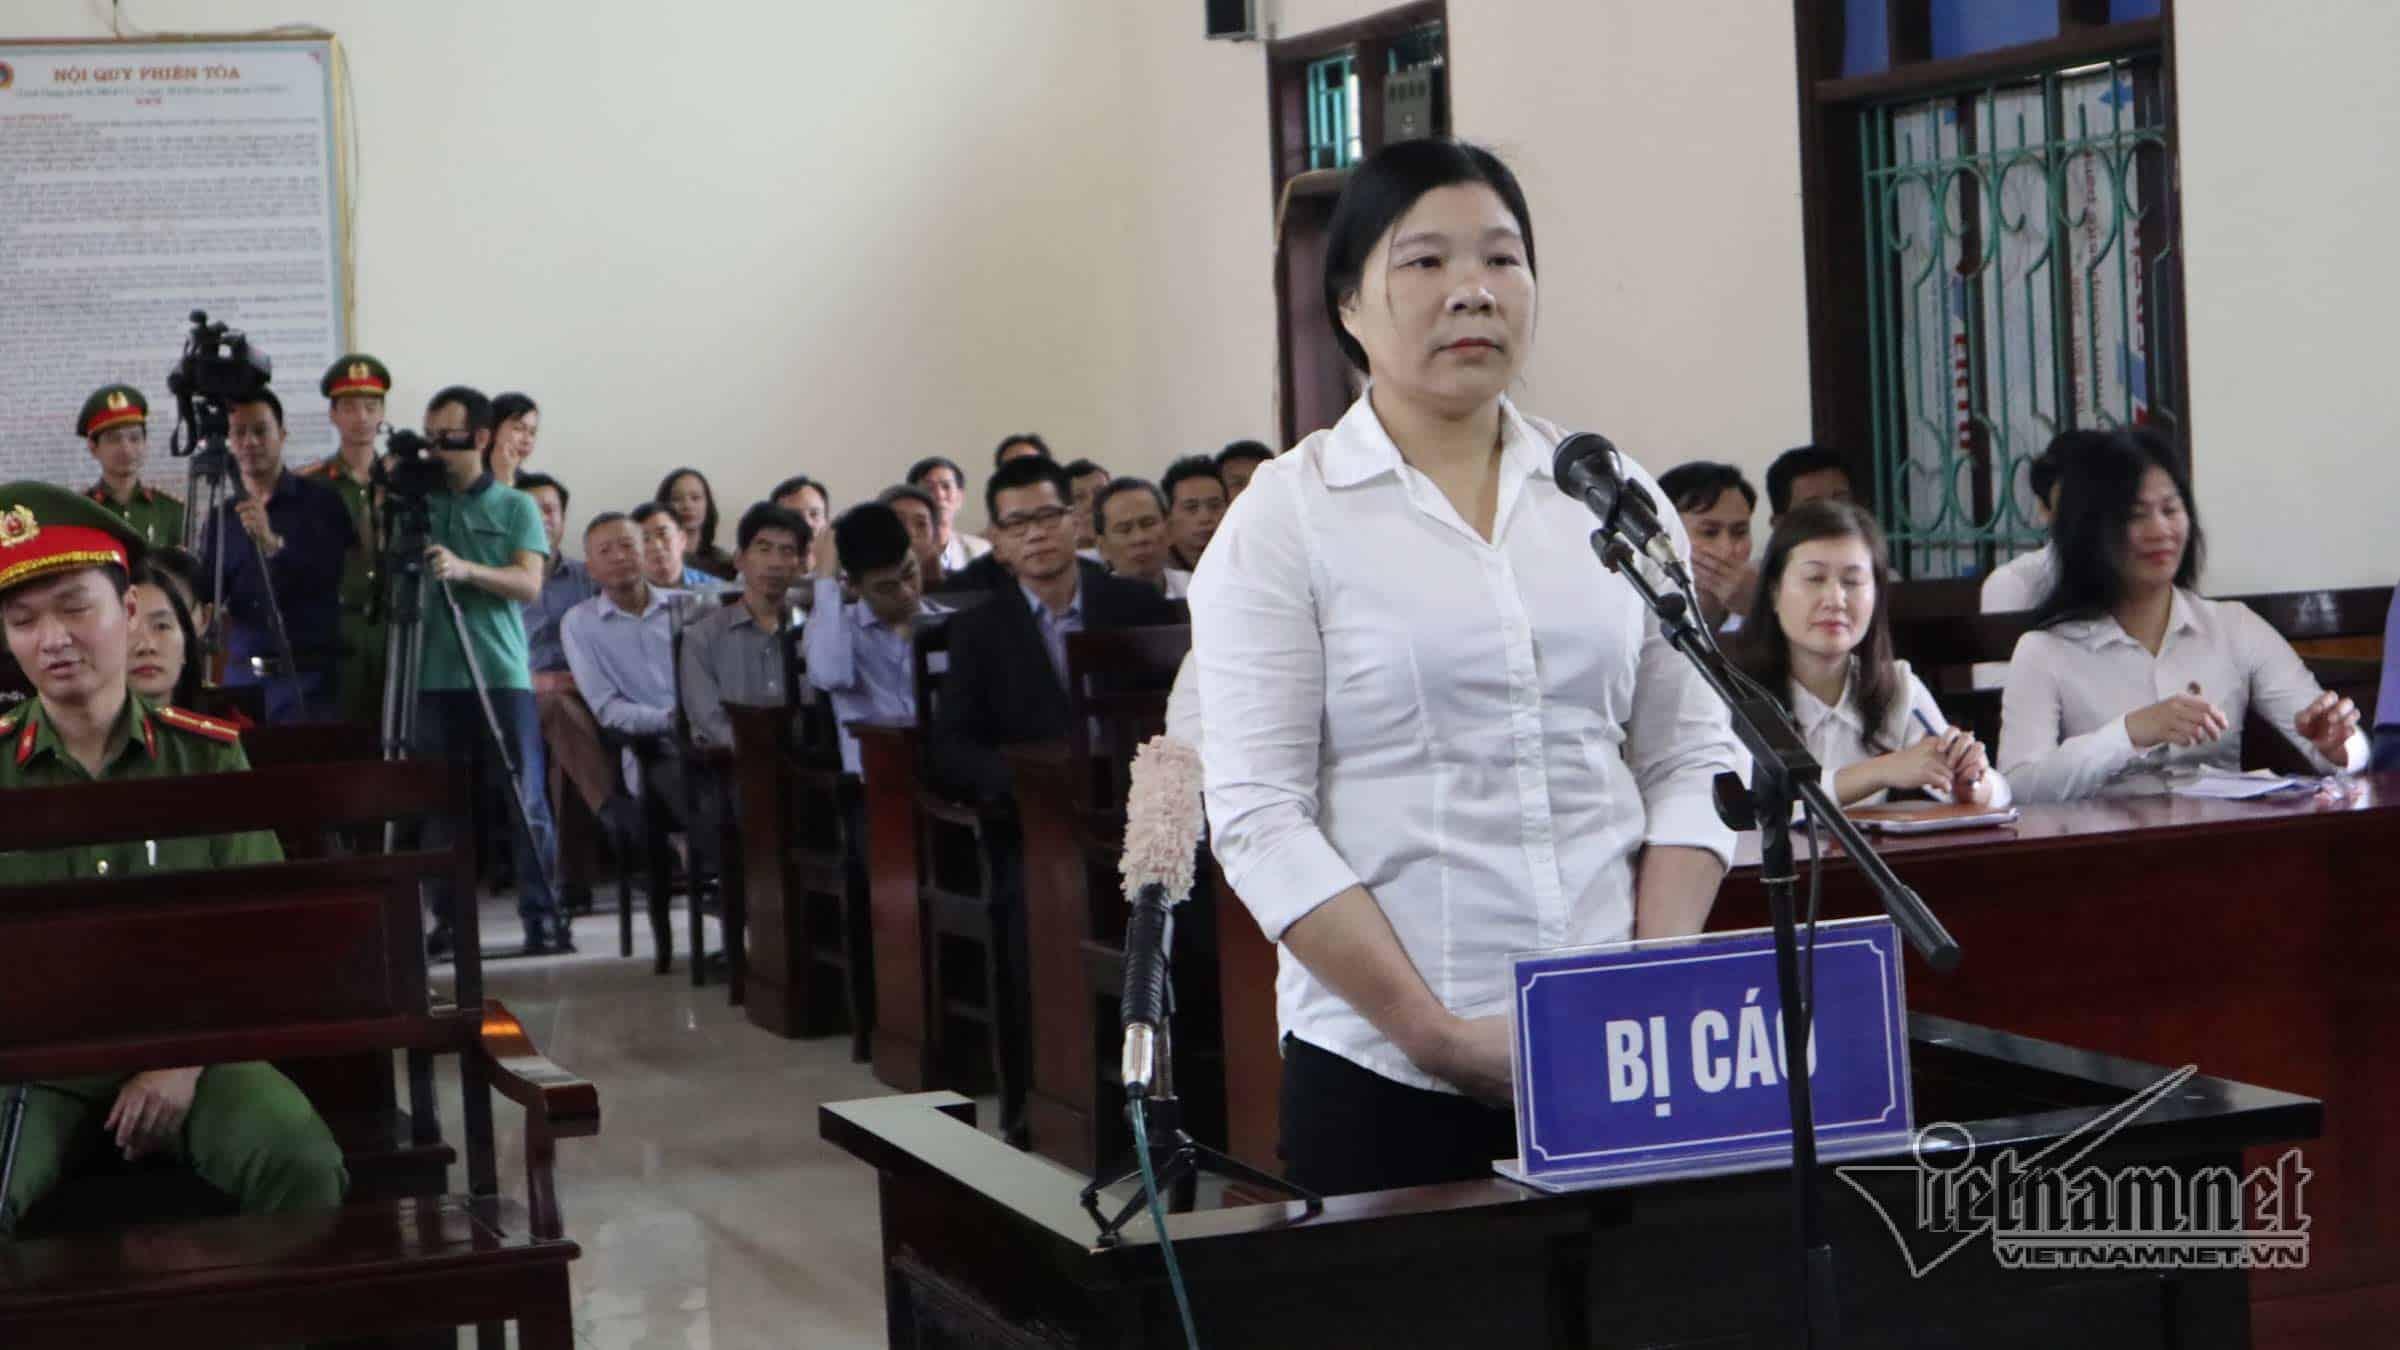 Tran Thi Xuan in Court April 2018_Source VietnamNet